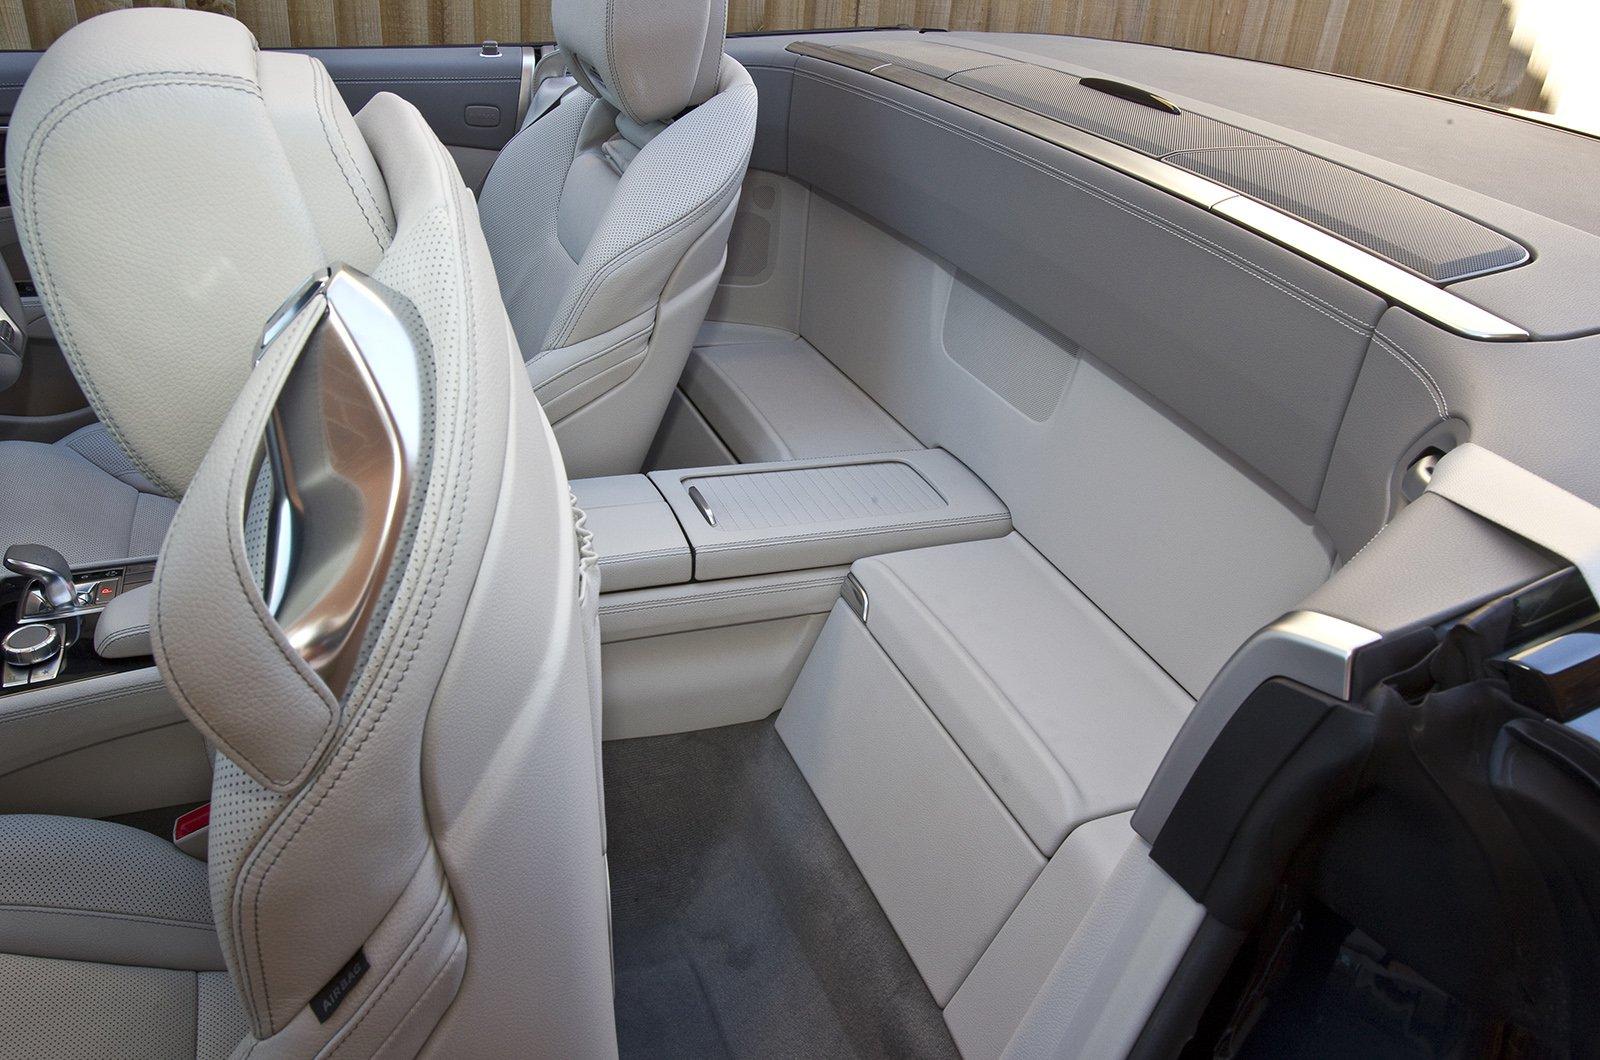 Mercedes SL rear storage